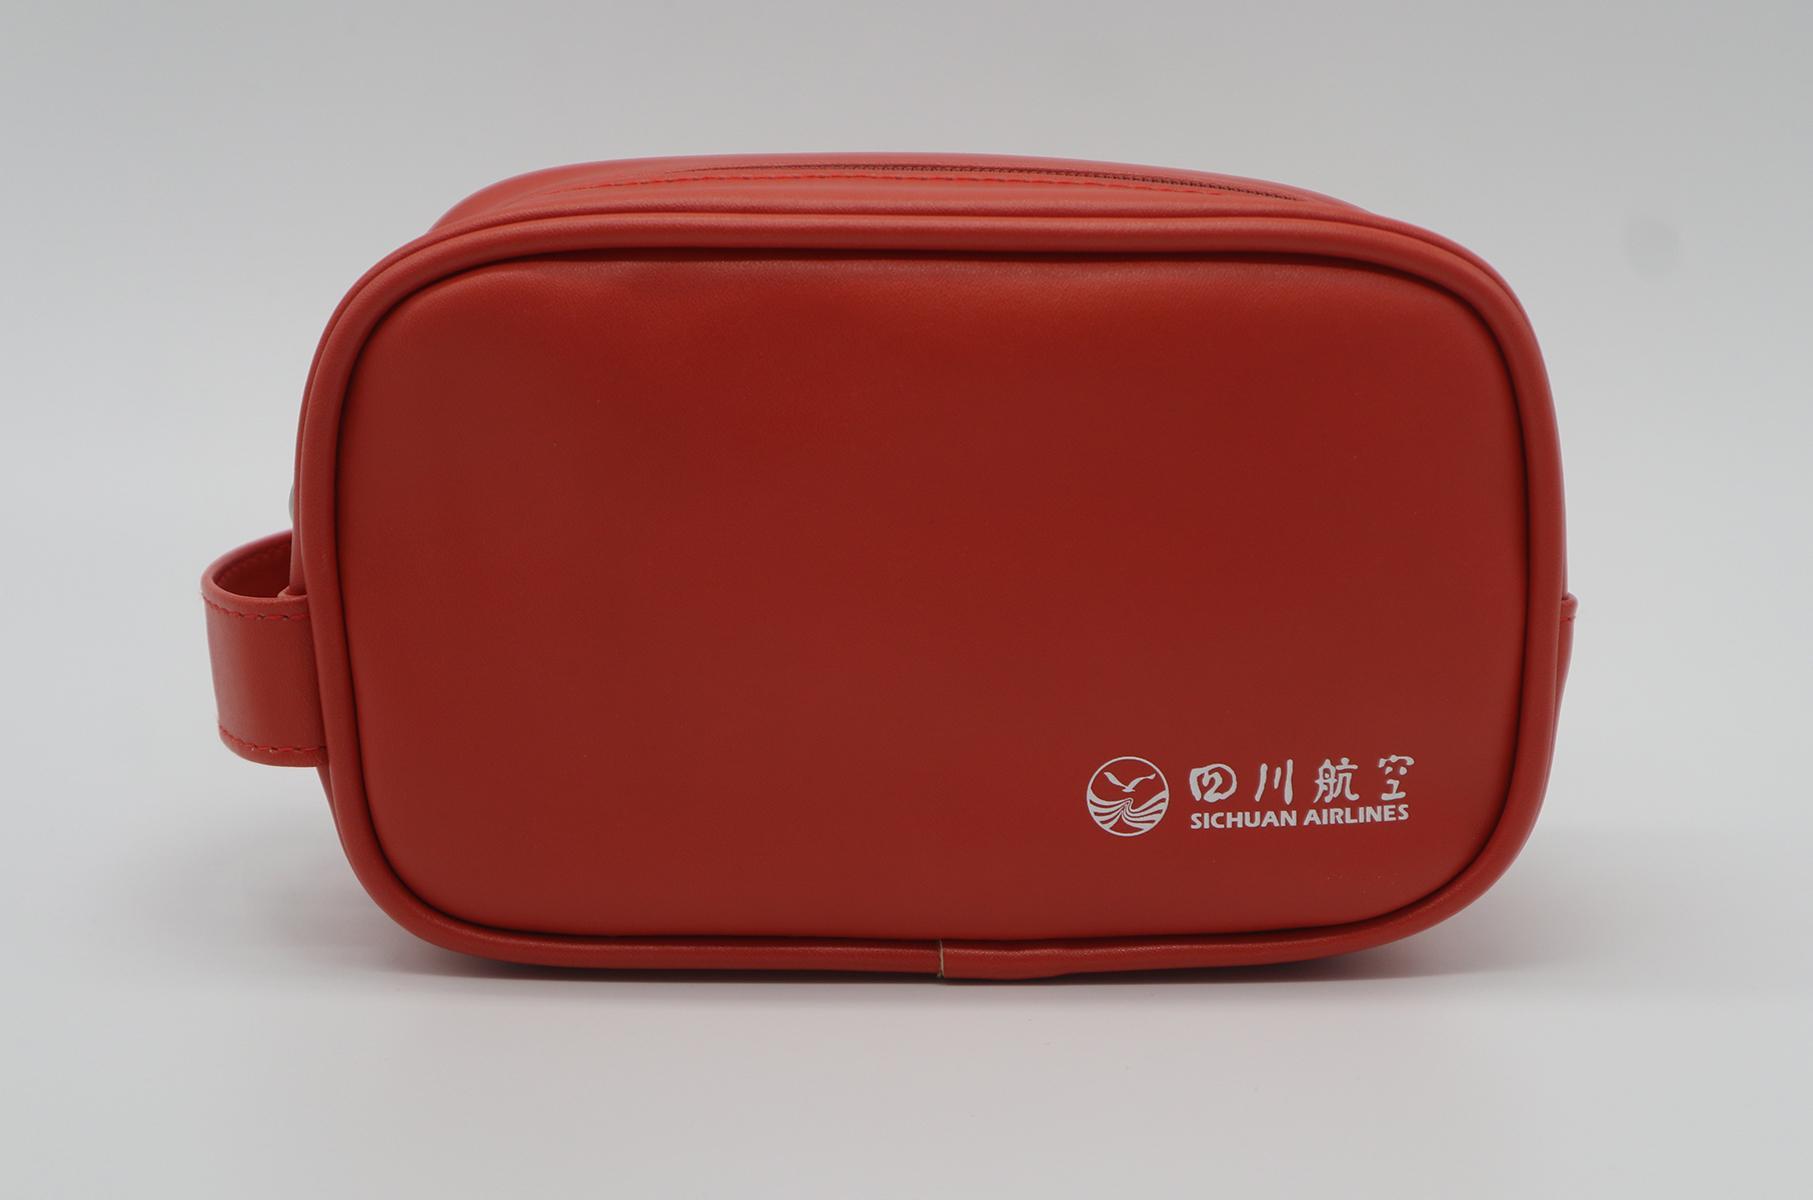 PU leather unisex airline amenity toiletry bag orange colour 2